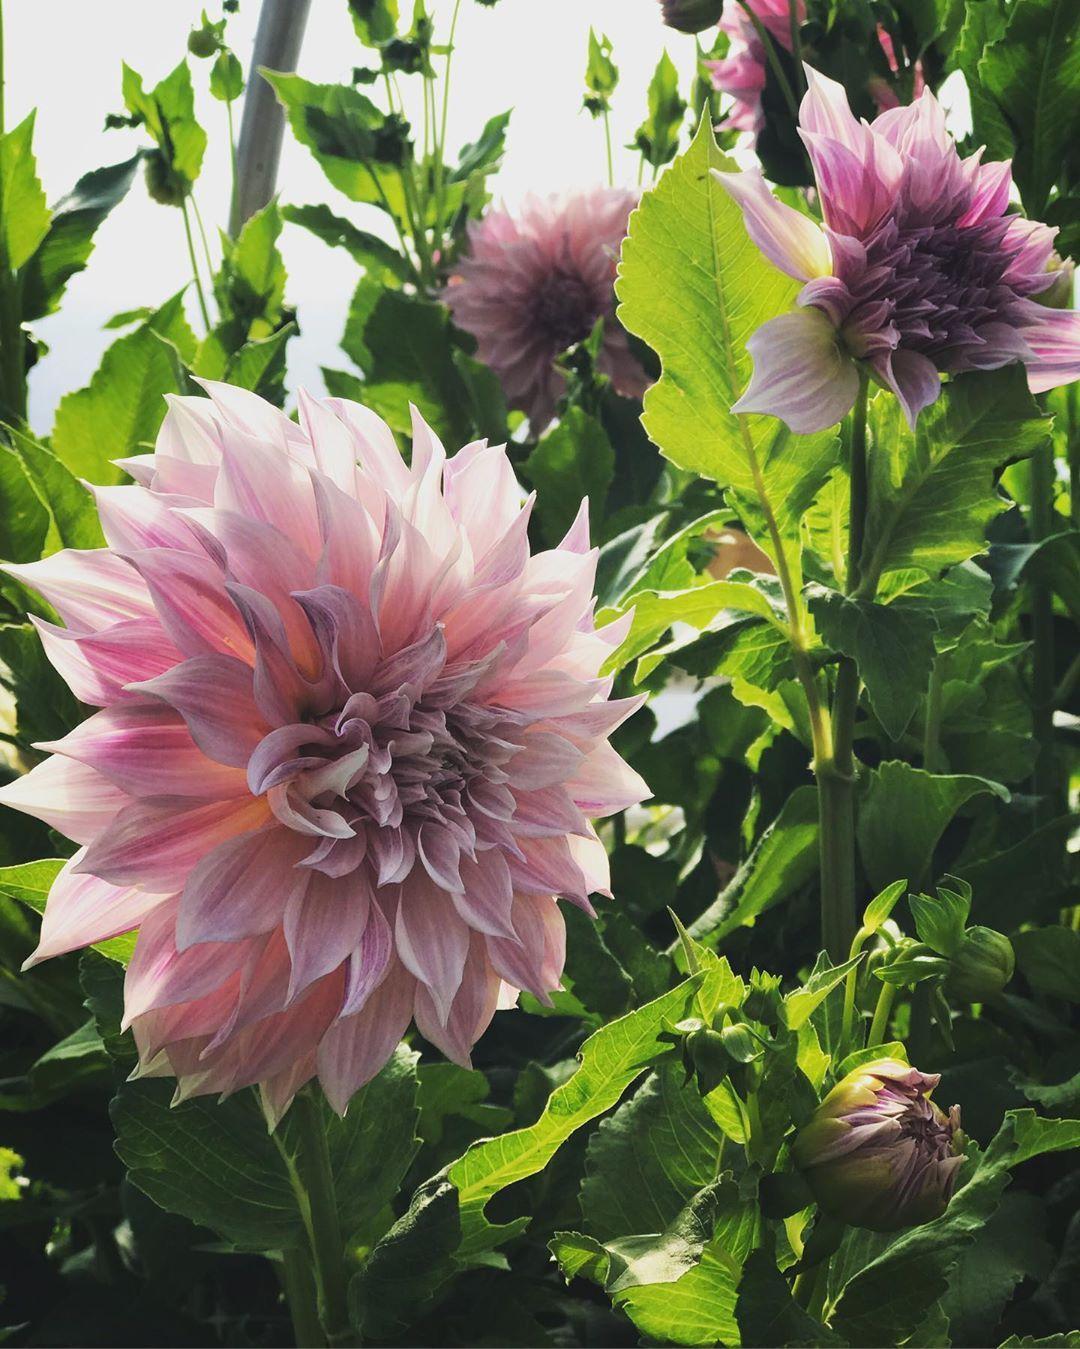 89 Likes, 1 Comments A.R. Pontius Flower Shop